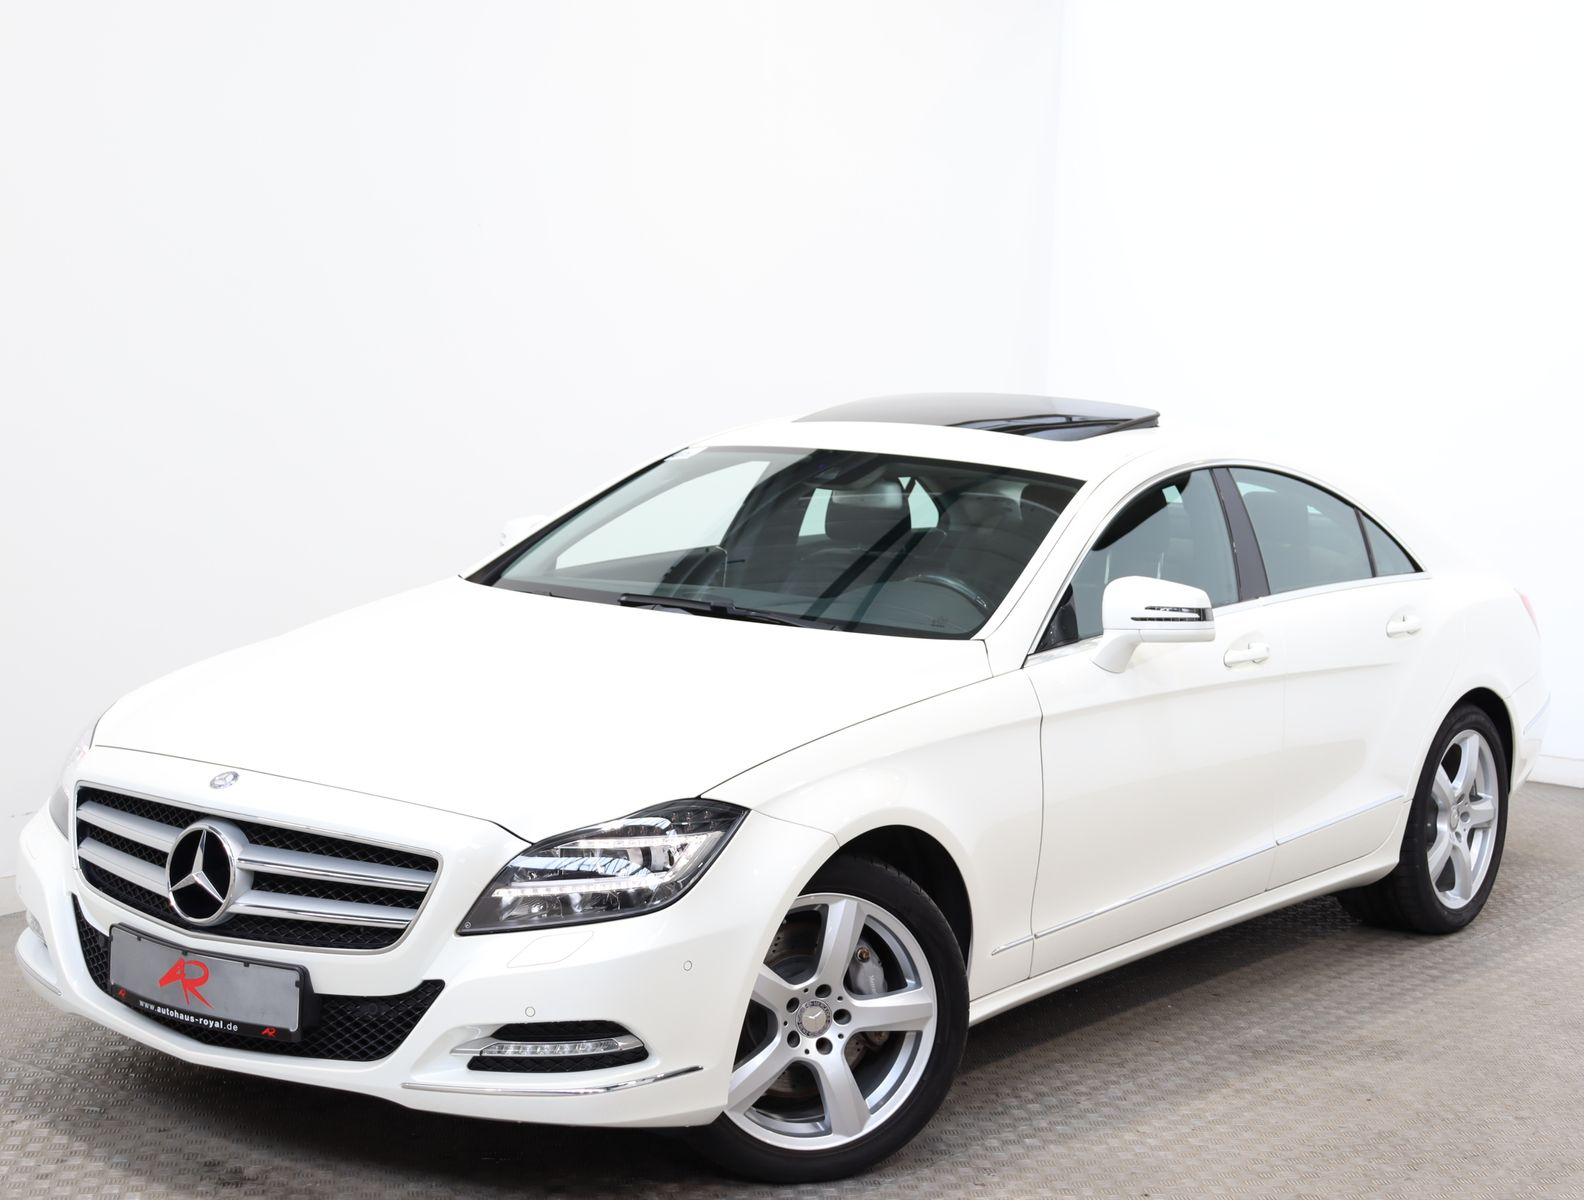 Mercedes-Benz CLS 350 CDI Coupe SPORT DESIGNO,MEMORY,HARMAN/K., Jahr 2014, Diesel